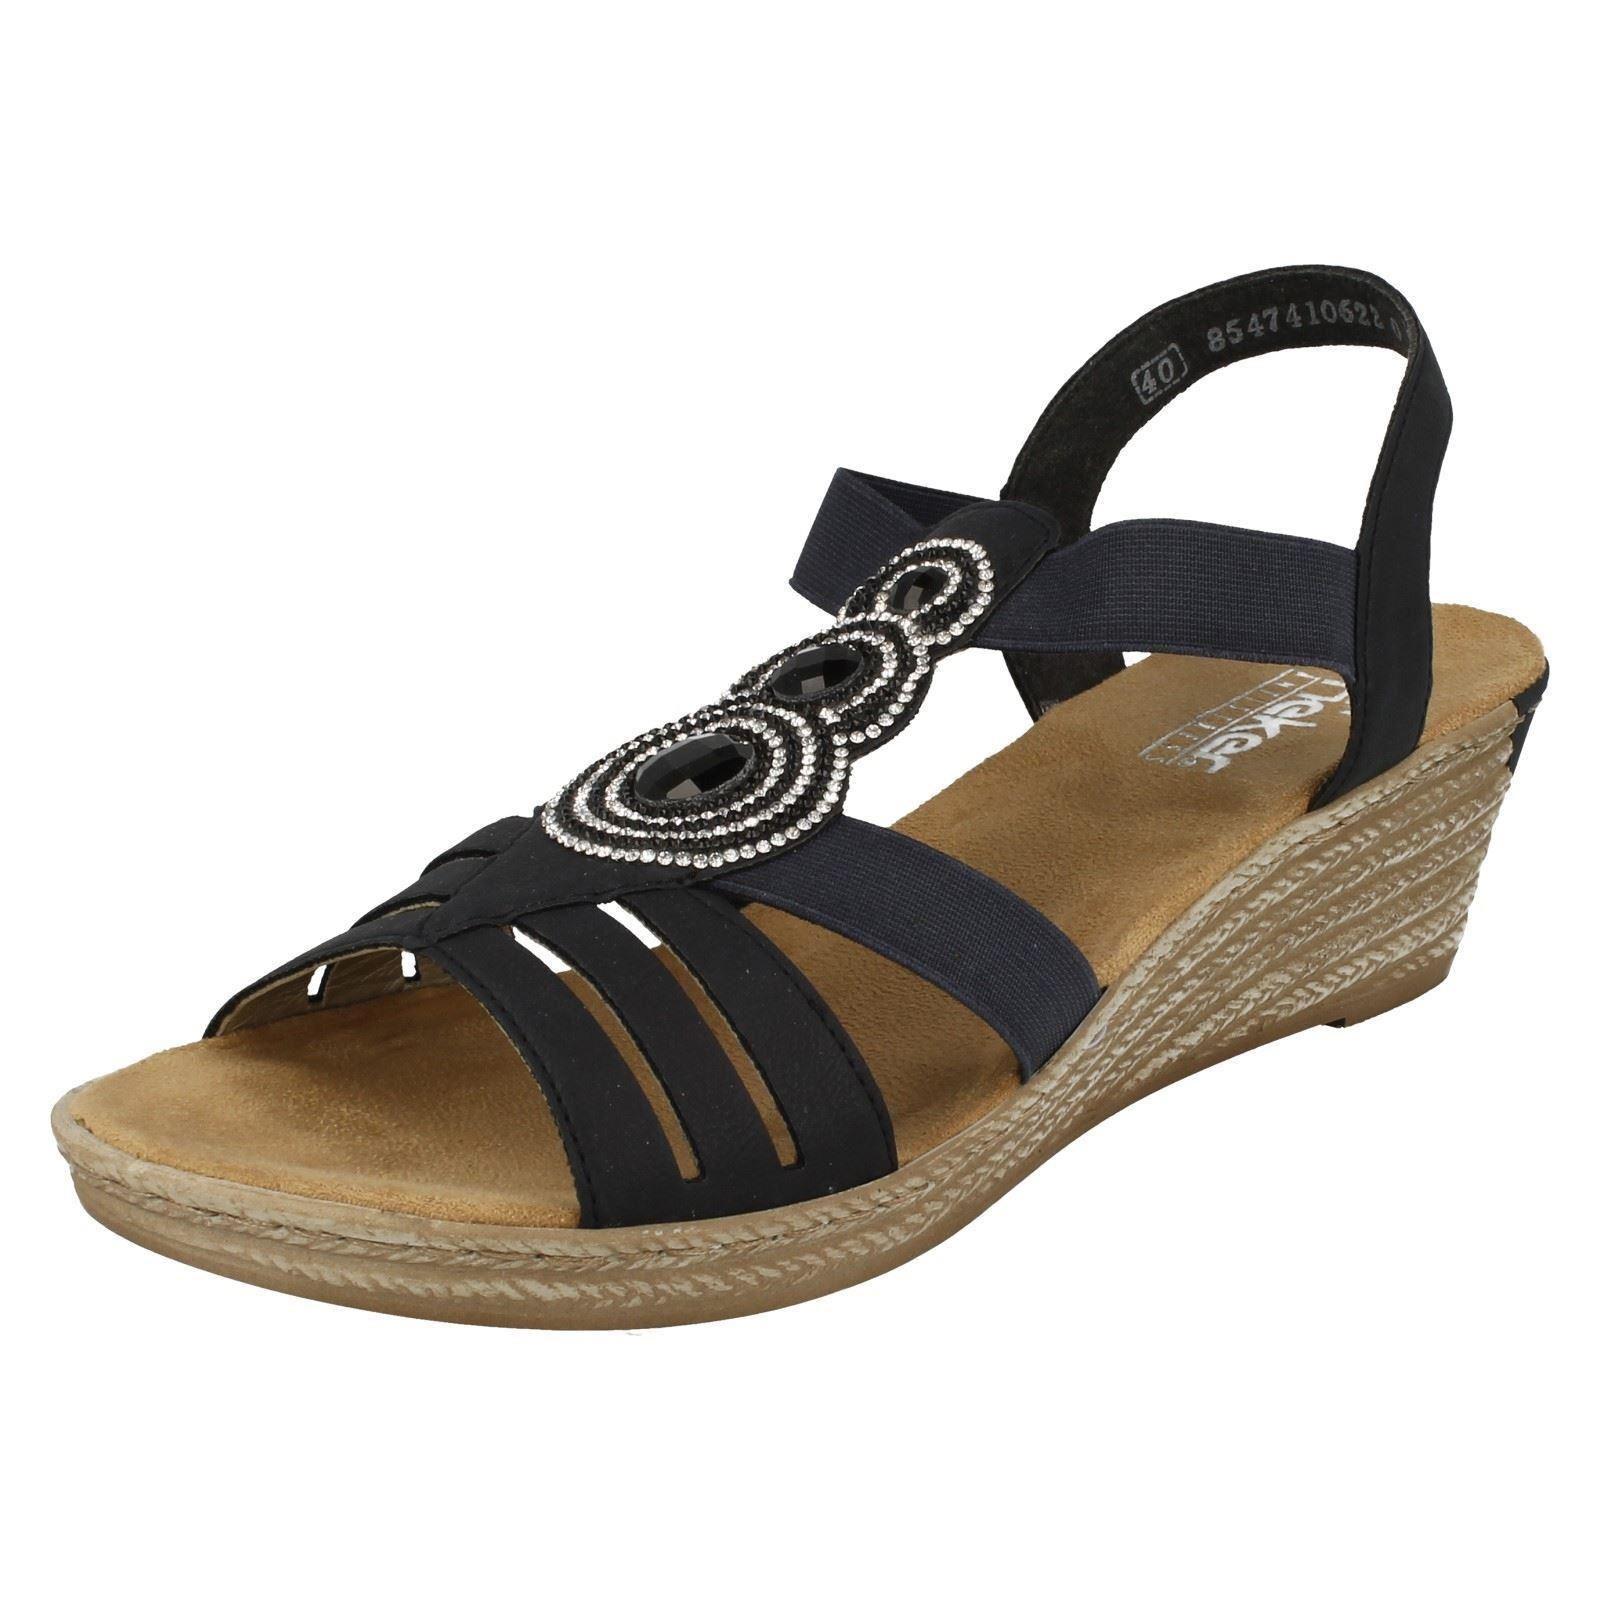 Ladies bluee   Grey Diamante Open Toe Toe Toe Wedge Rieker Sandals 62459 33b306